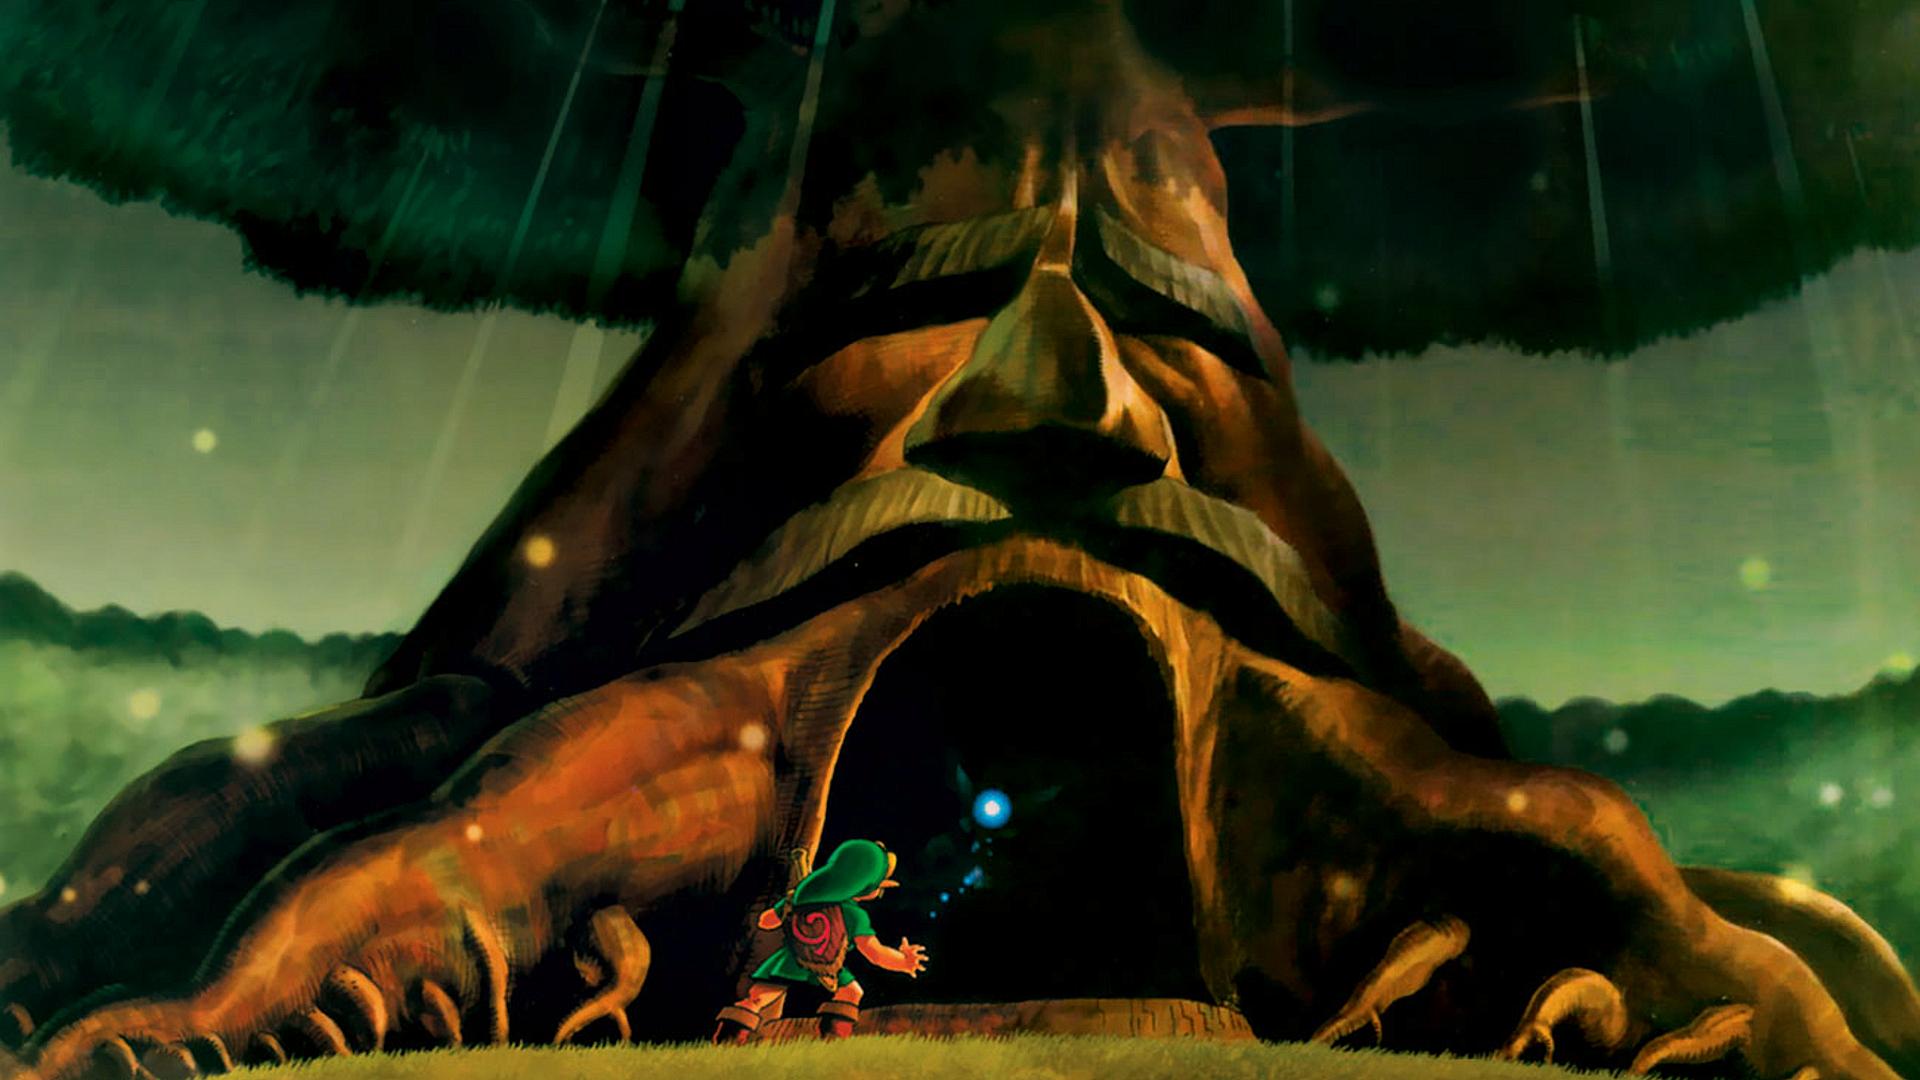 The Legend Of Zelda Ocarina Of Time Hd Wallpaper Background Image